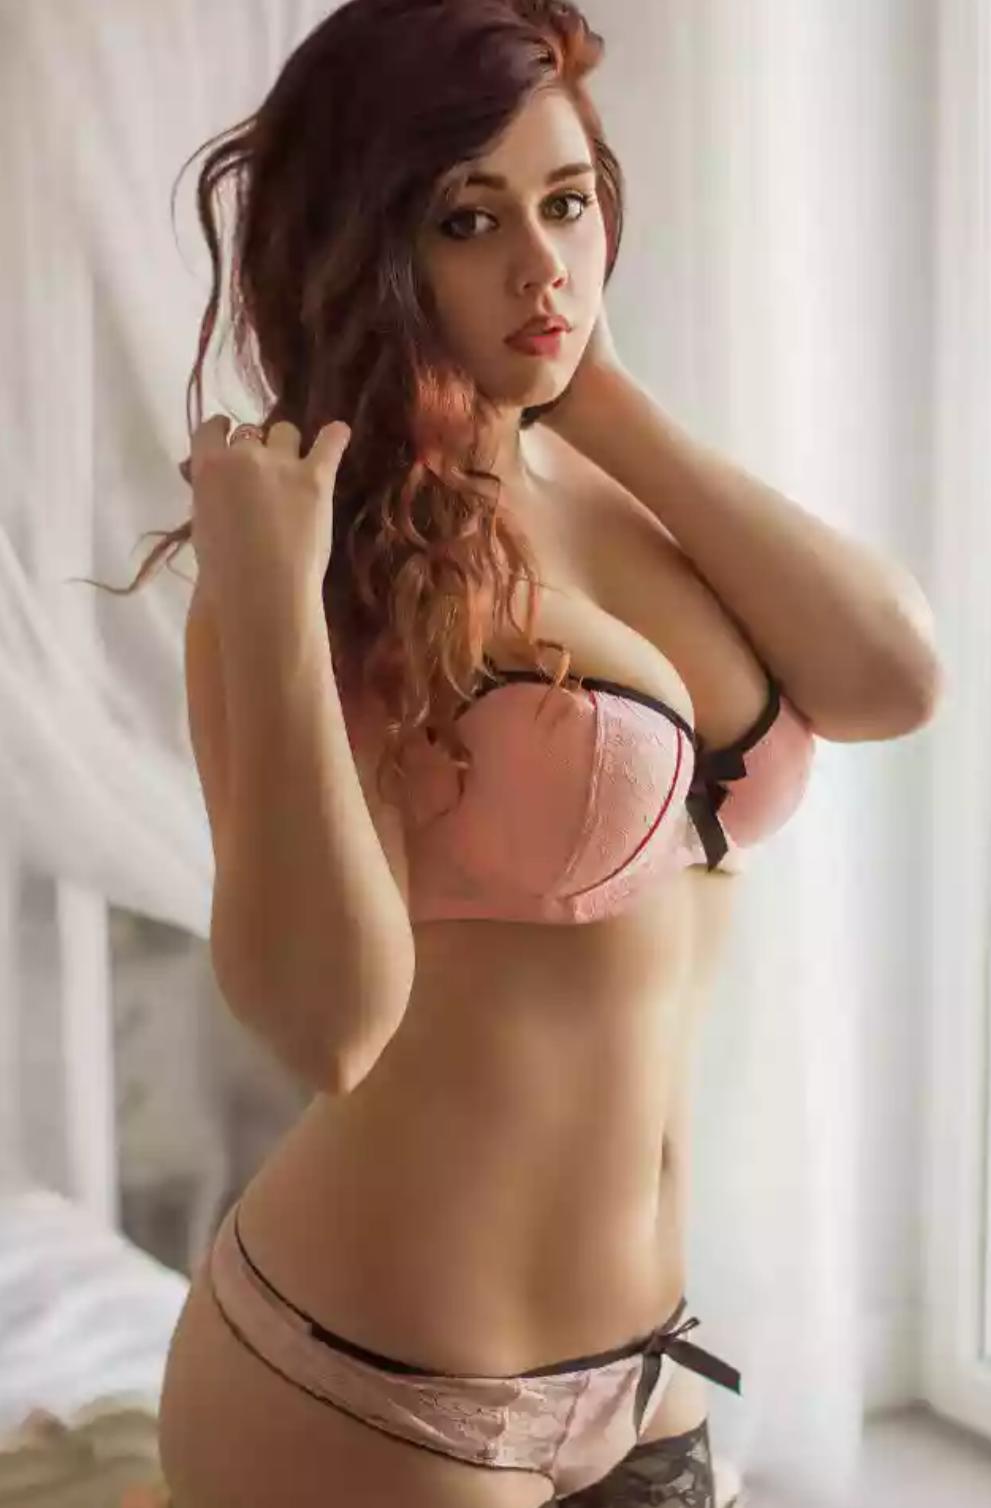 Girl in stylish bra